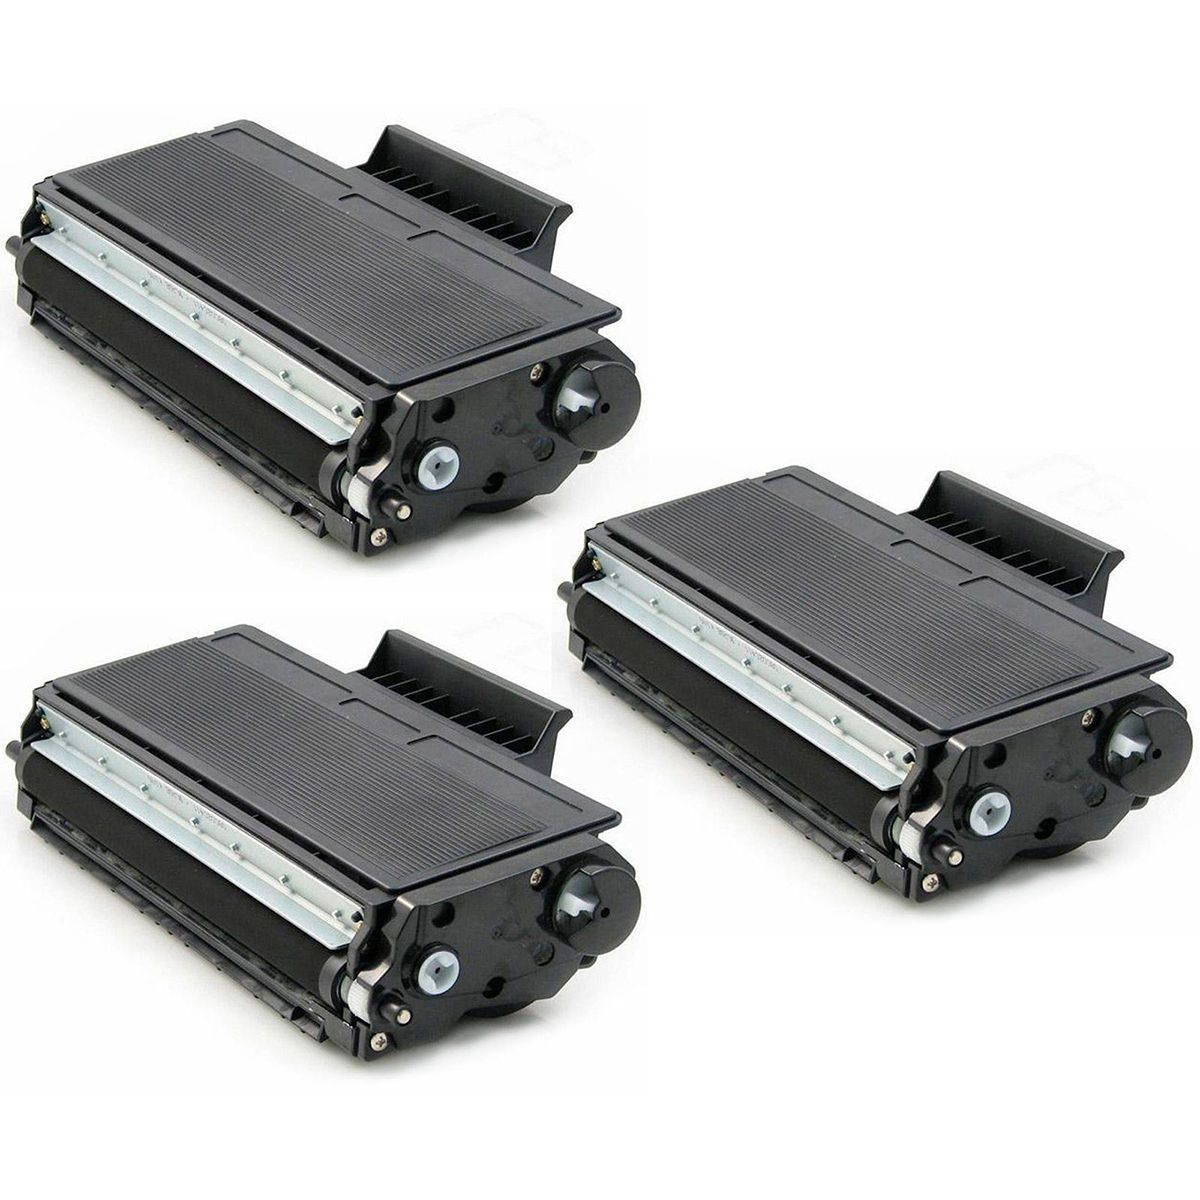 Compatível: Kit 3x Toner TN580 TN620 TN650 para Brother HL-5240 DCP-8060 8065 8080 8085 8660dn 8460n / Preto / 8.000